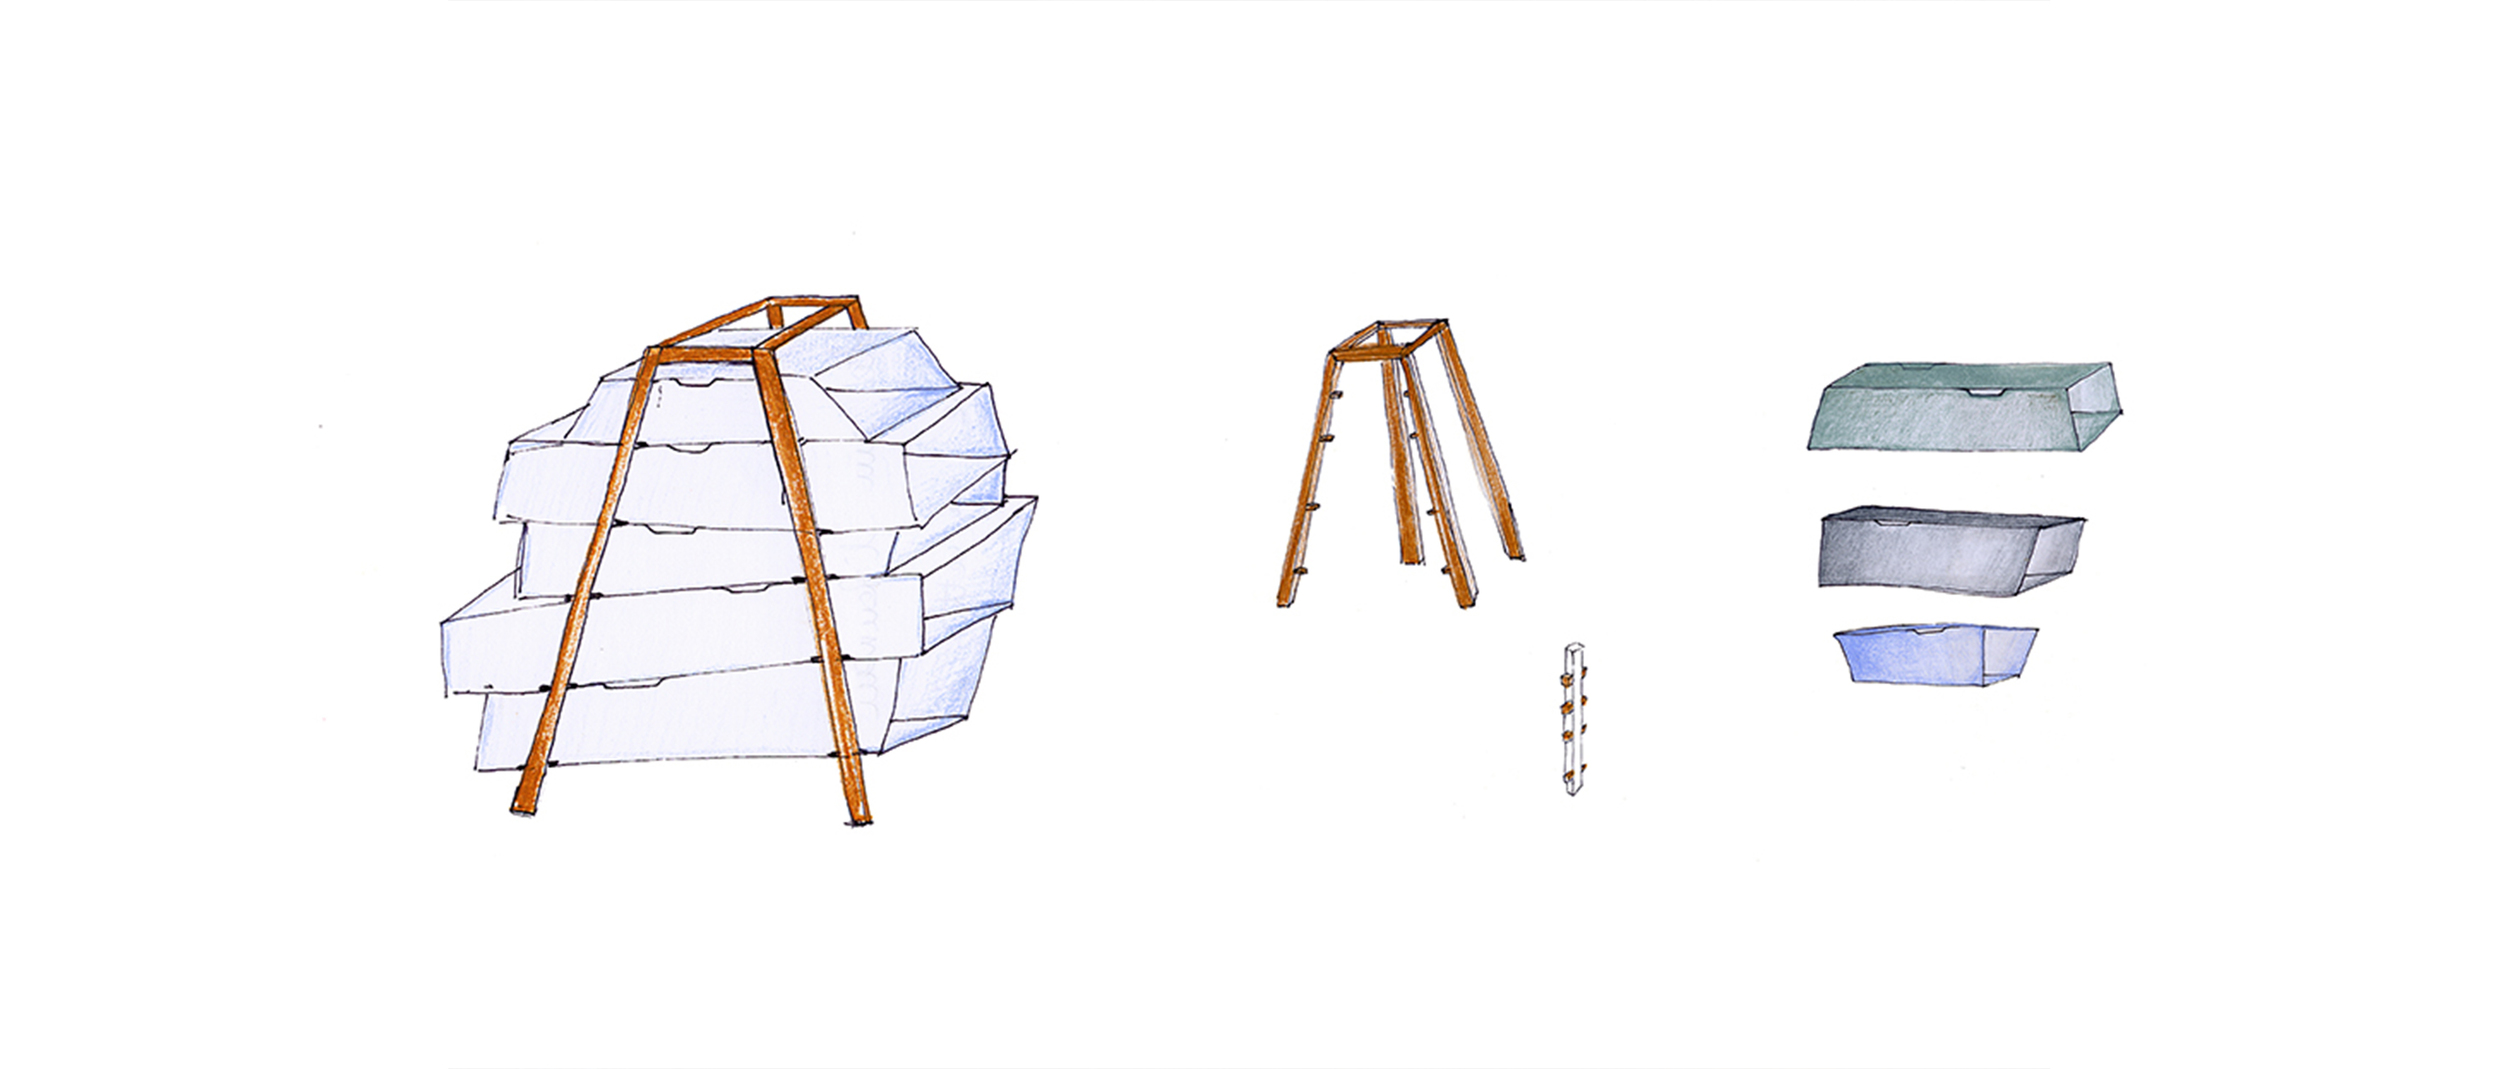 ClarisseDubus-WoodStock-Drawing-1-3000x1500.jpg